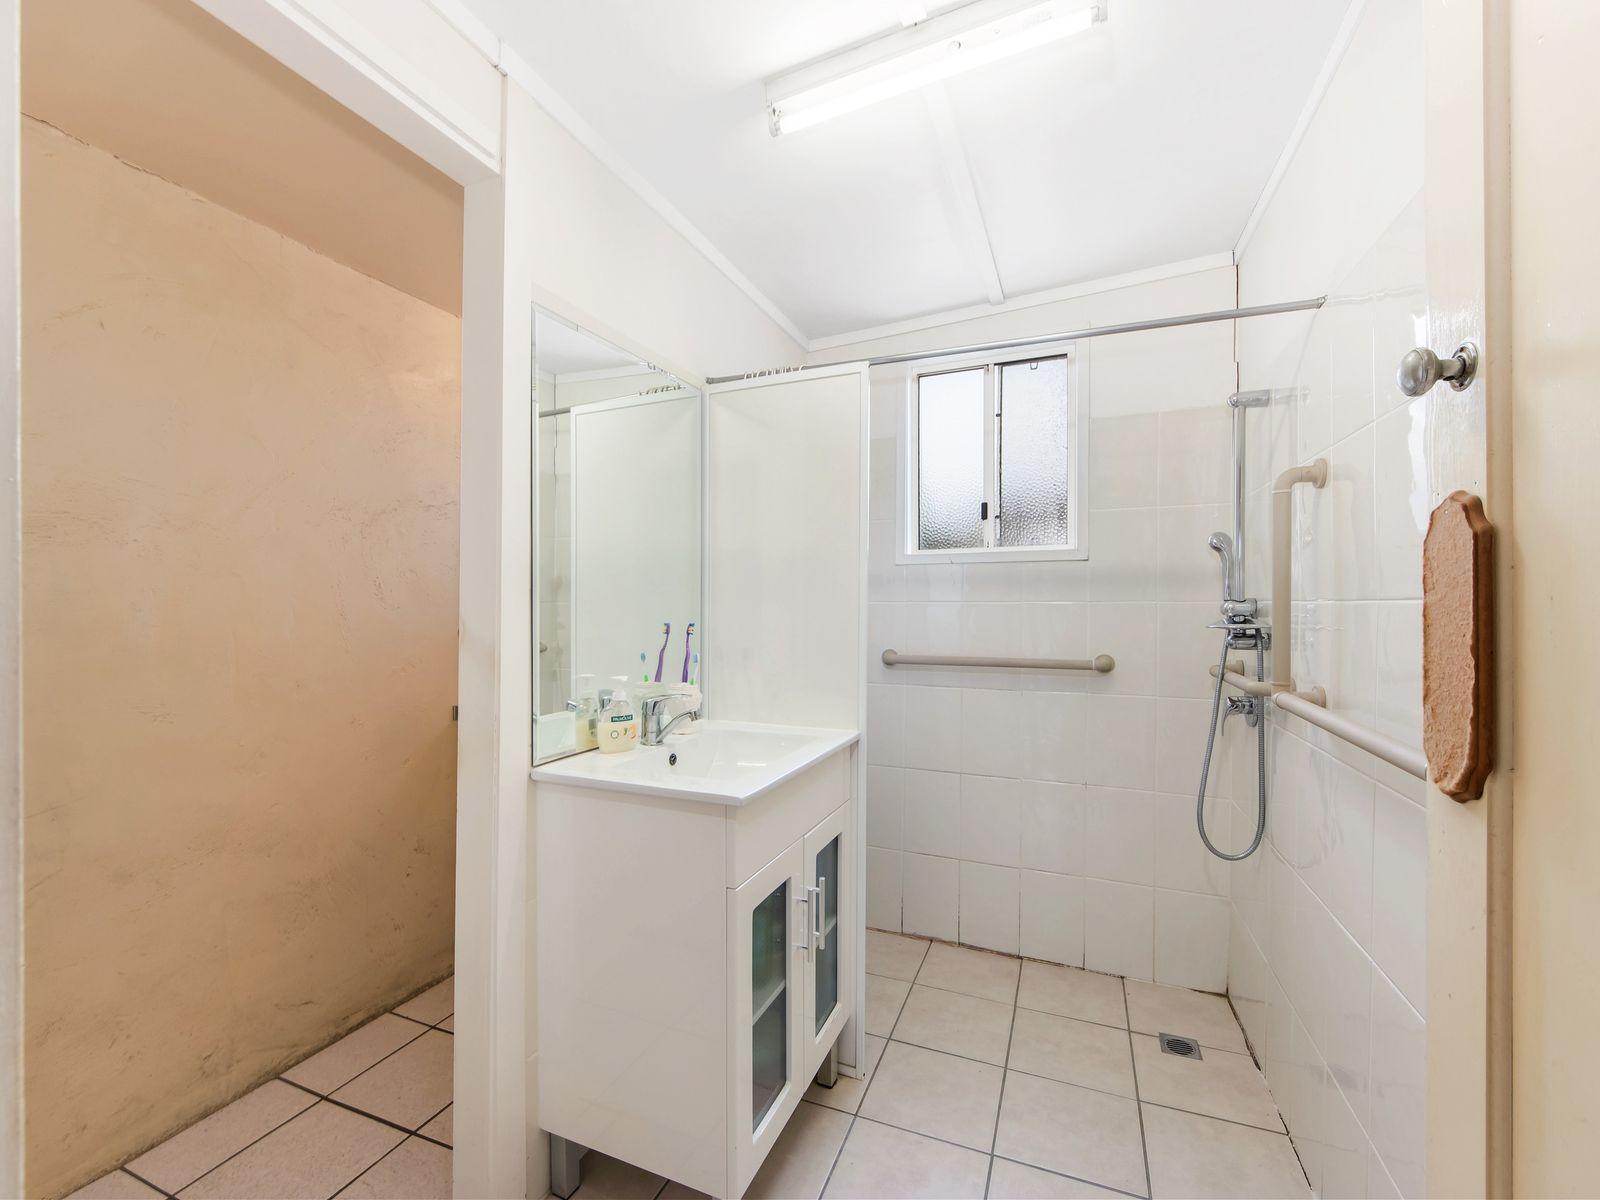 39 Waghorn Street, Ipswich, QLD 4305